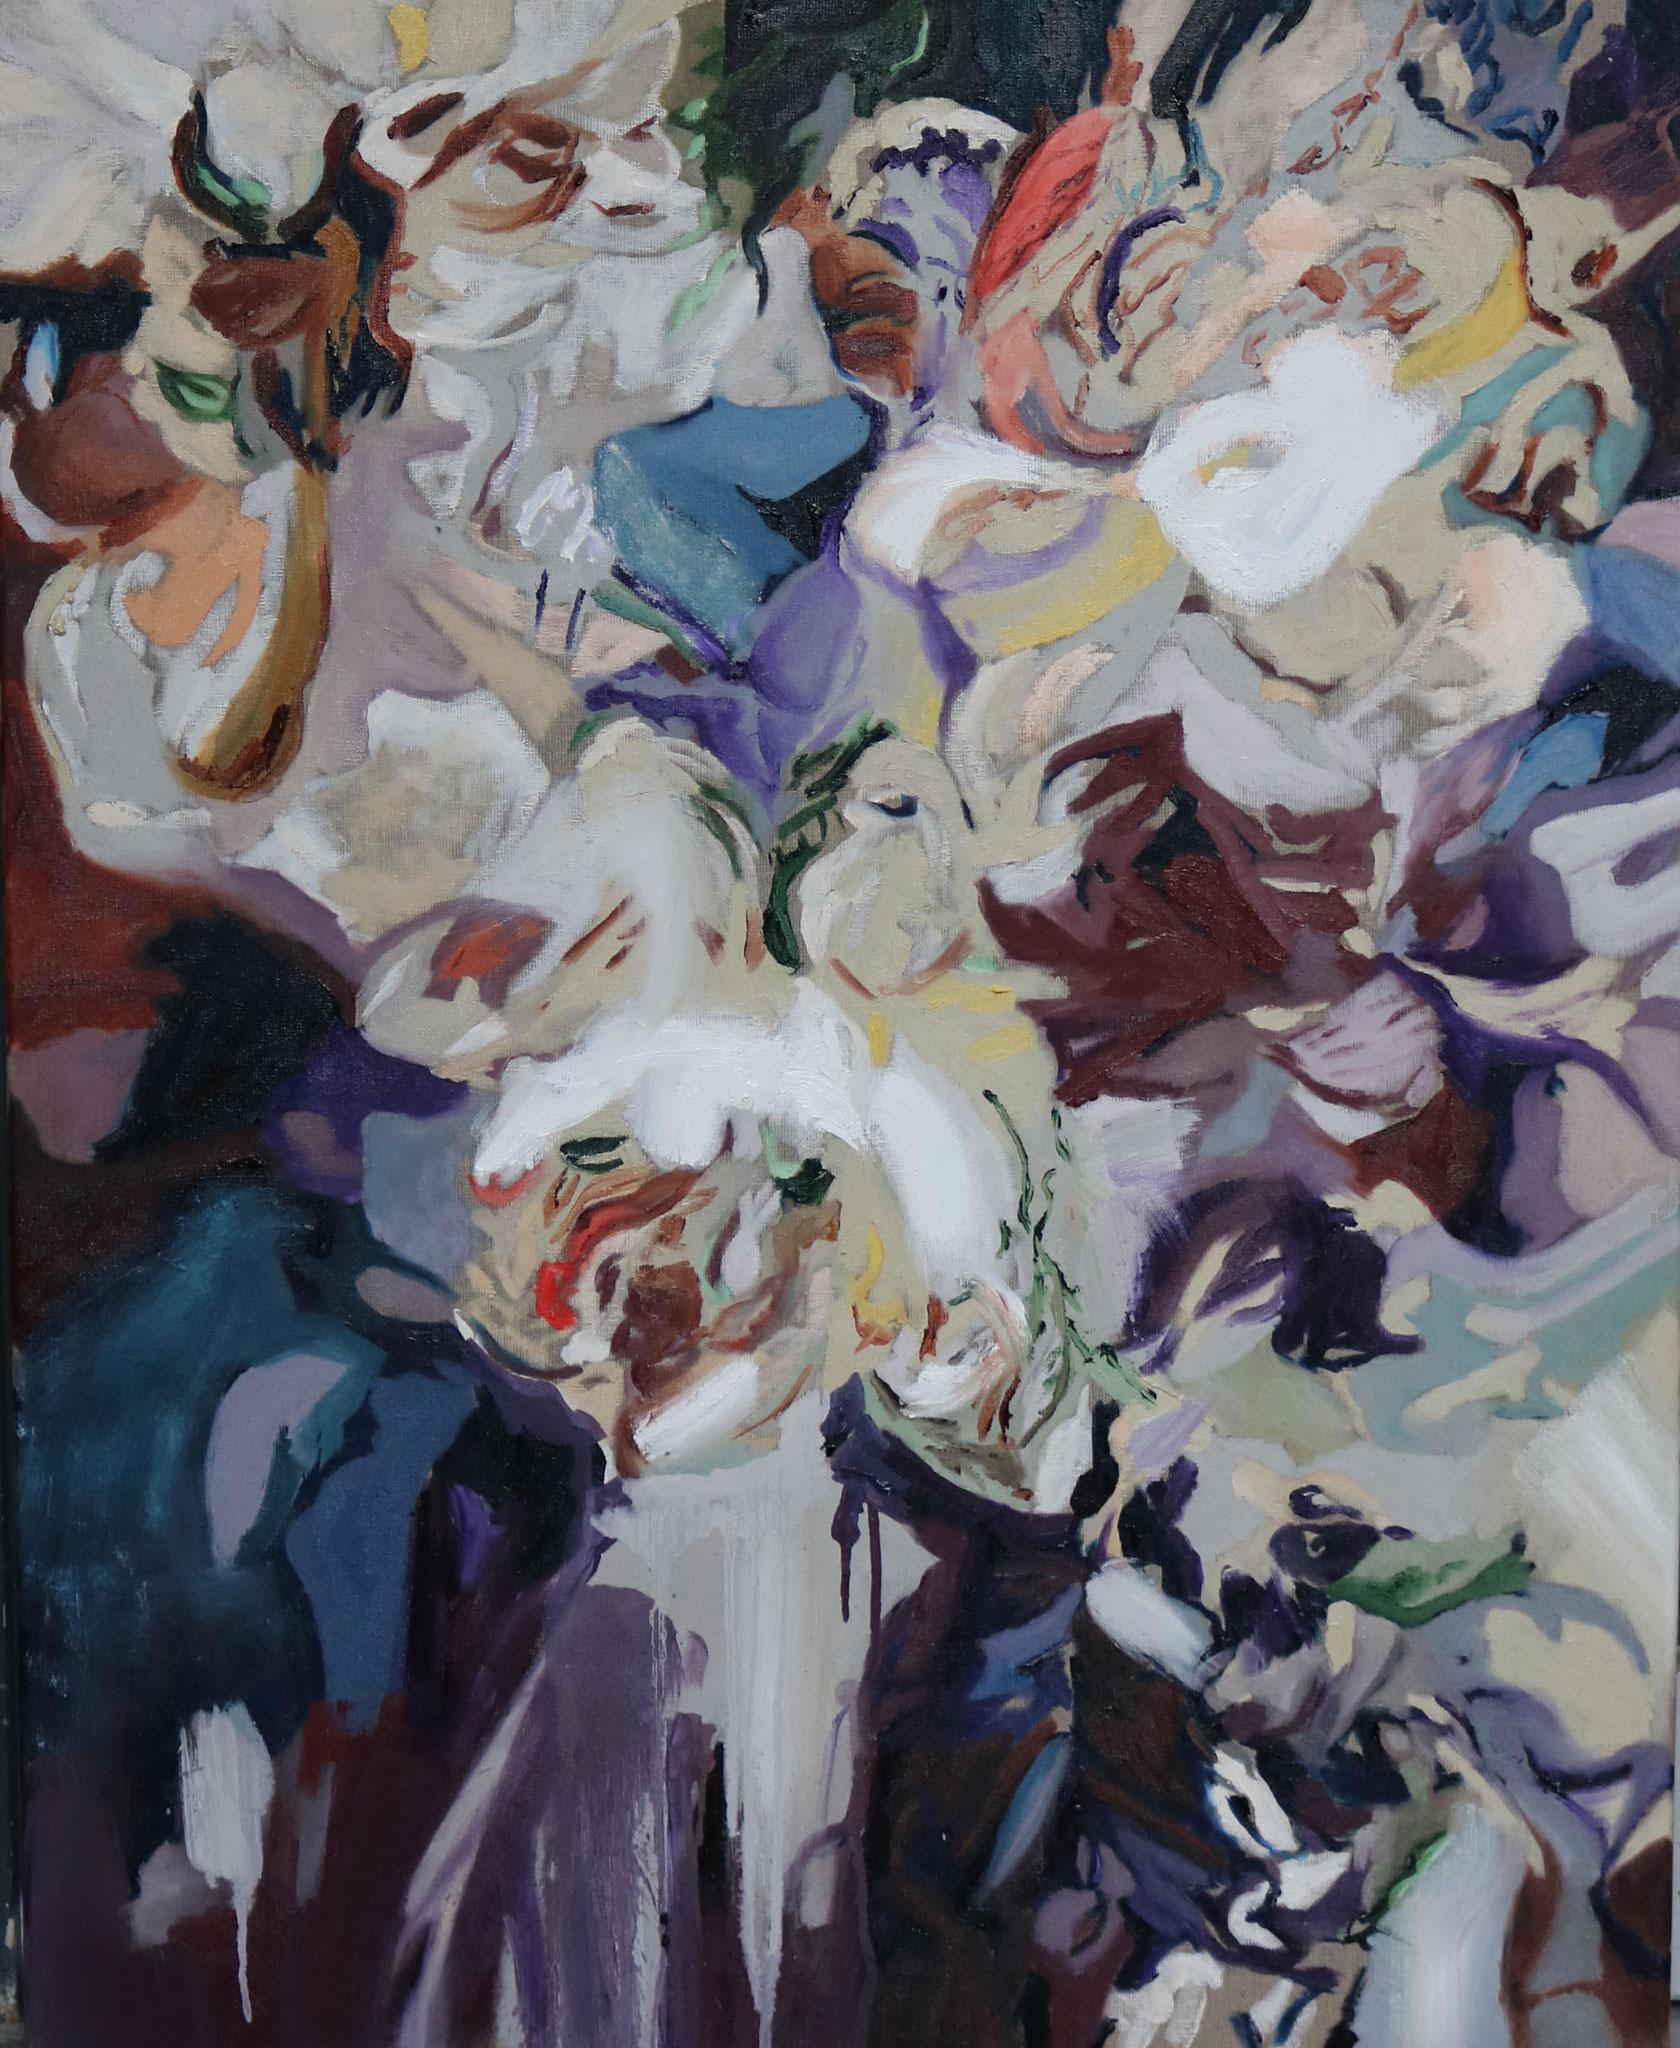 """Blumen II"" 80 x 100cm - Öl auf Leinwand 2017"